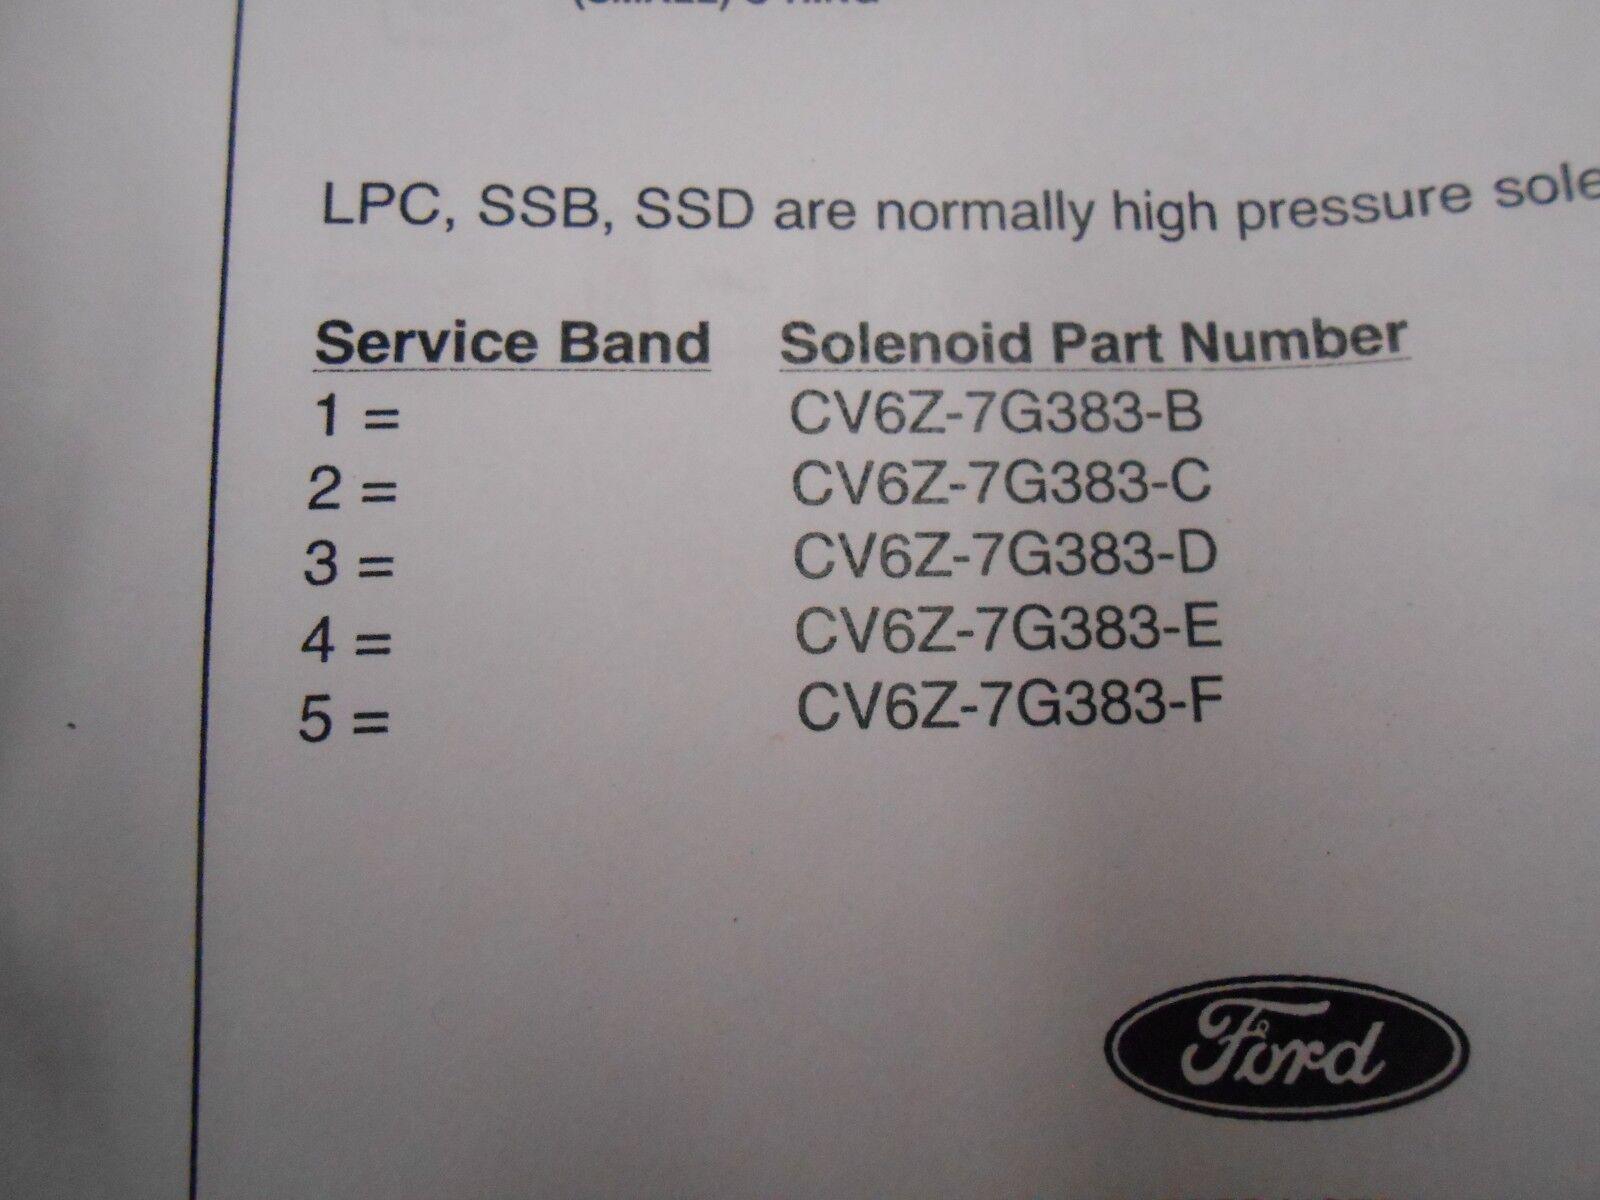 CV6Z-7G383-D 6F35 SHIFT SOLENOID NORMALLY HIGH BLACK NOZZLE #3 FLOW SSB//SSD//LPC